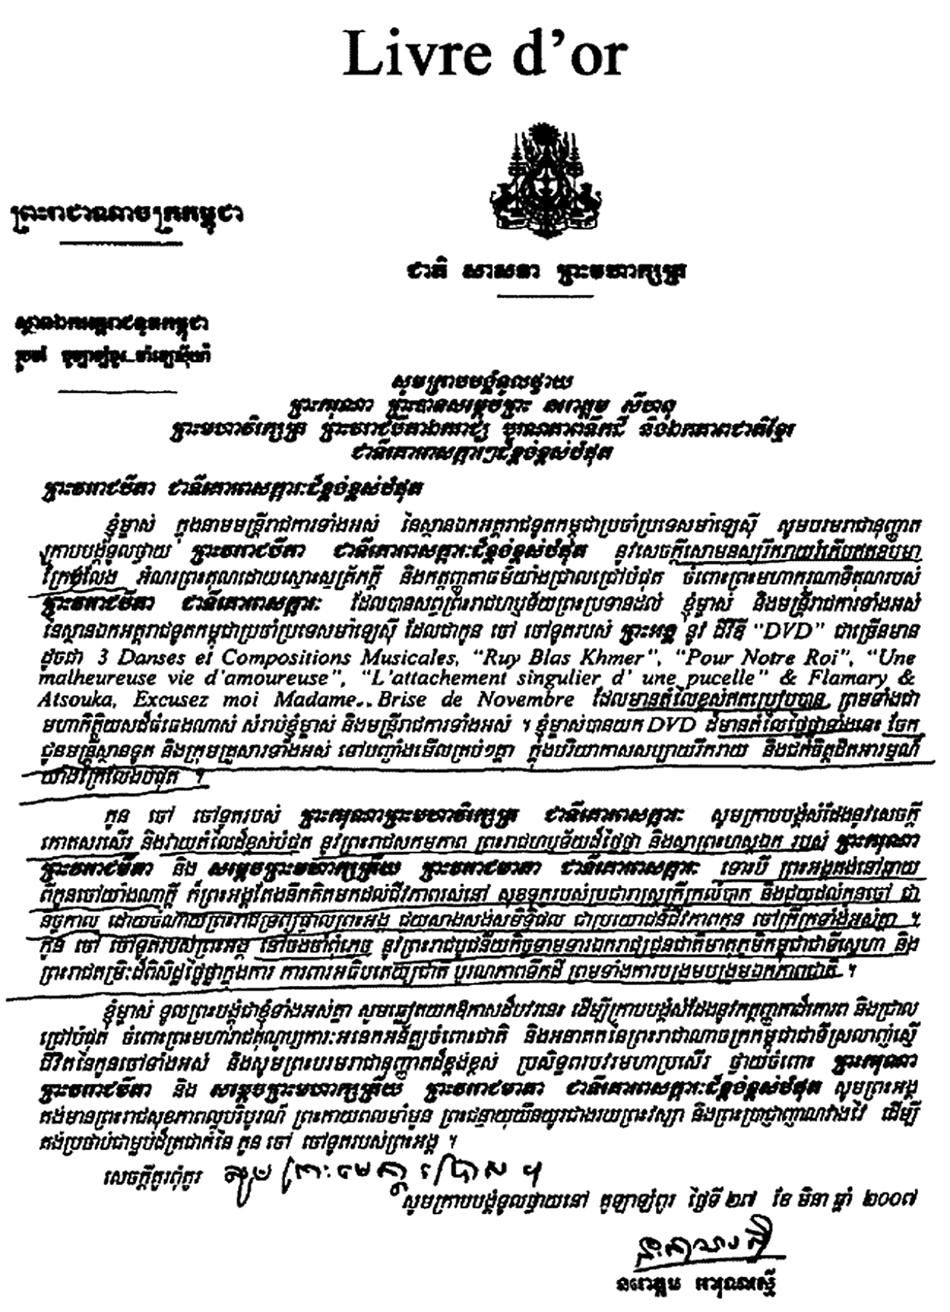 All/document/Documents/Cinma/LivredOr/id2290/photo001.jpg